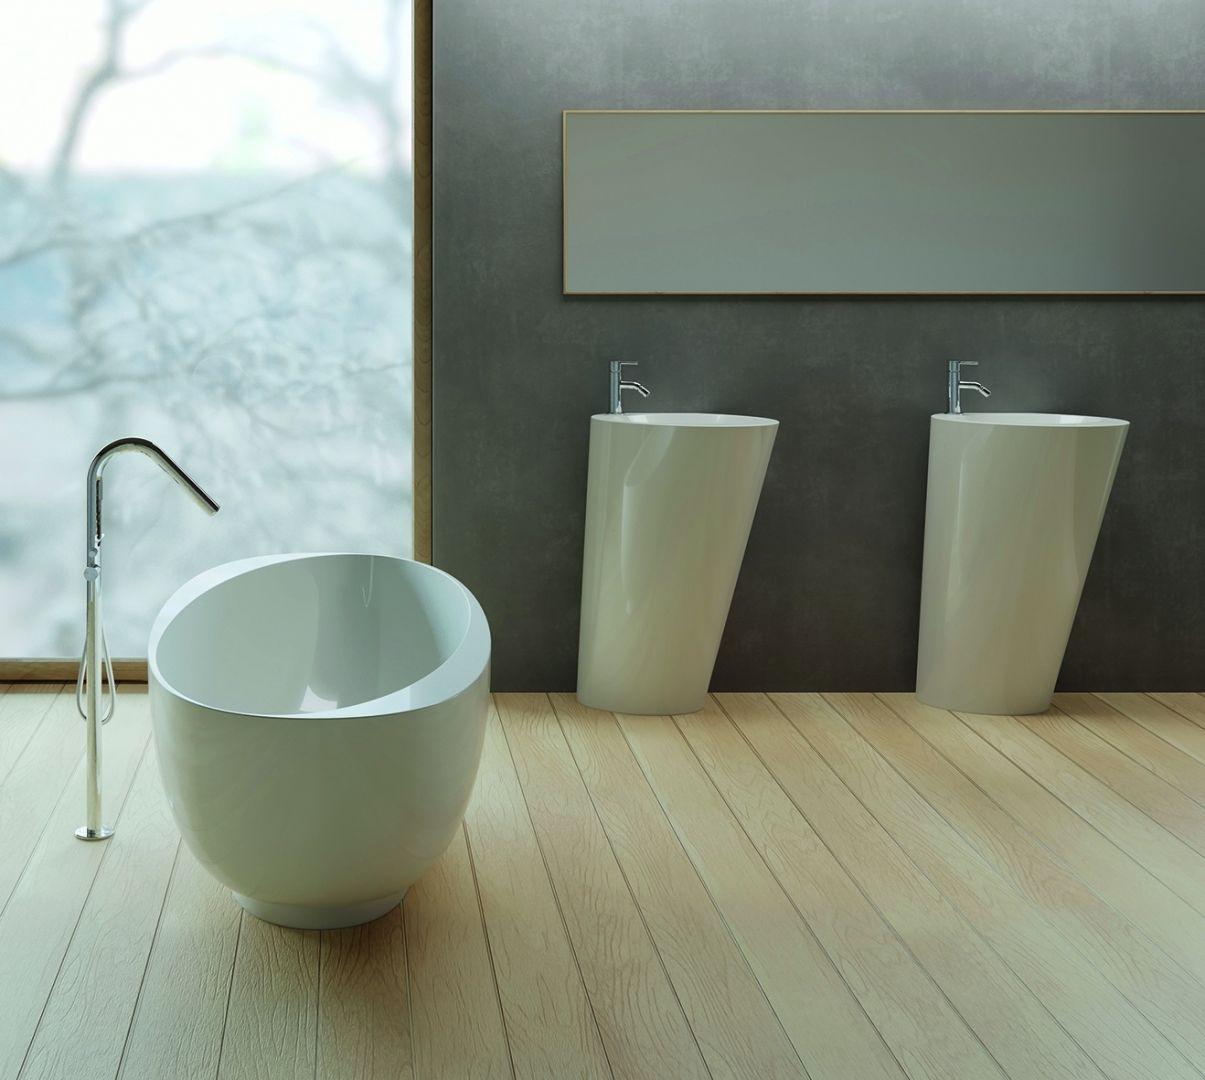 Podłogowe umywalki z kolekcji Amos marki Marmorin Design. Fot. Marmorin Design